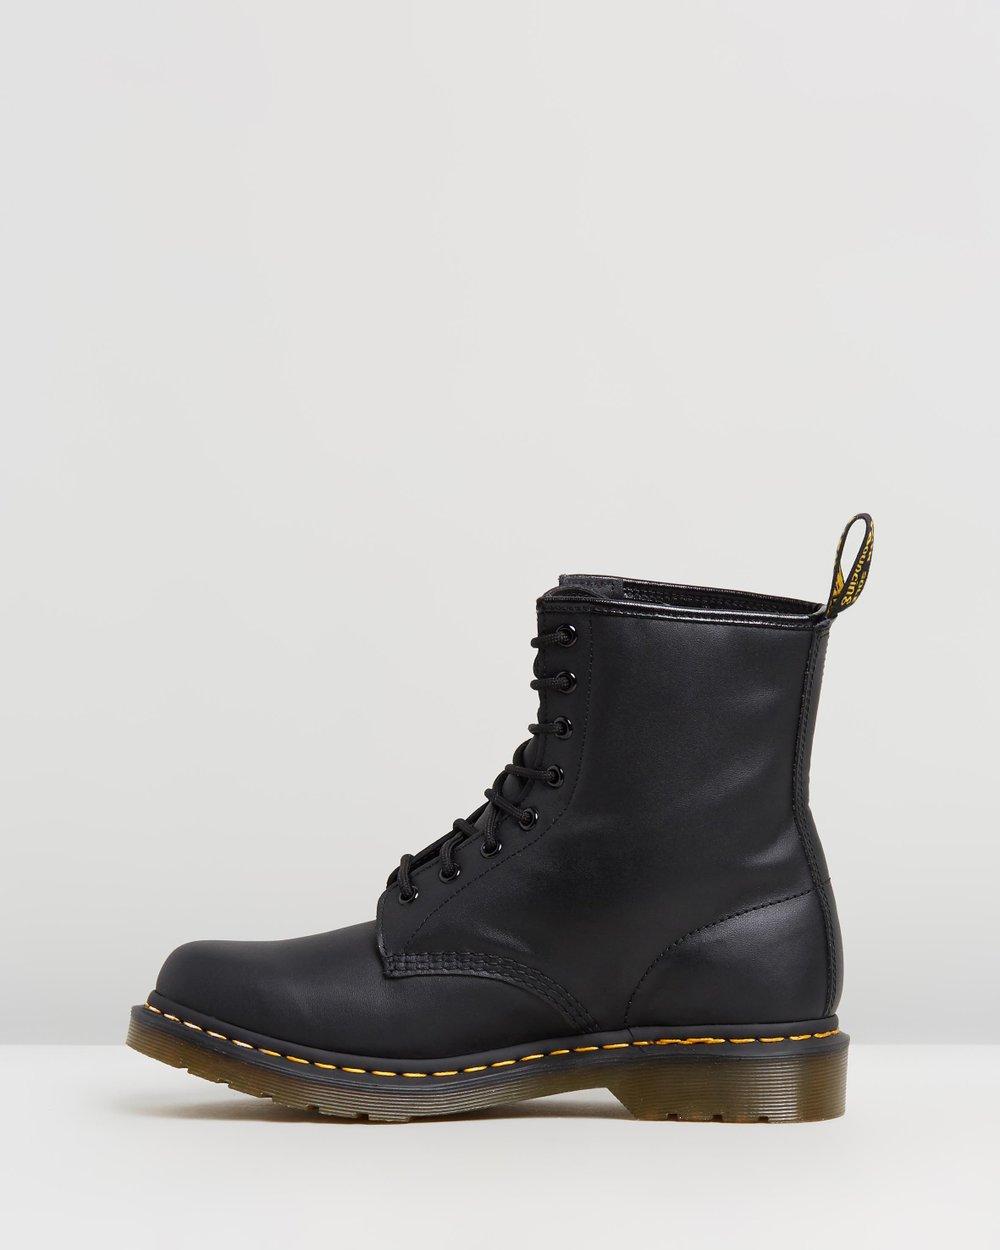 c38e07742401 1460 Vonda 8-Eye Boots - Women s by Dr Martens Online